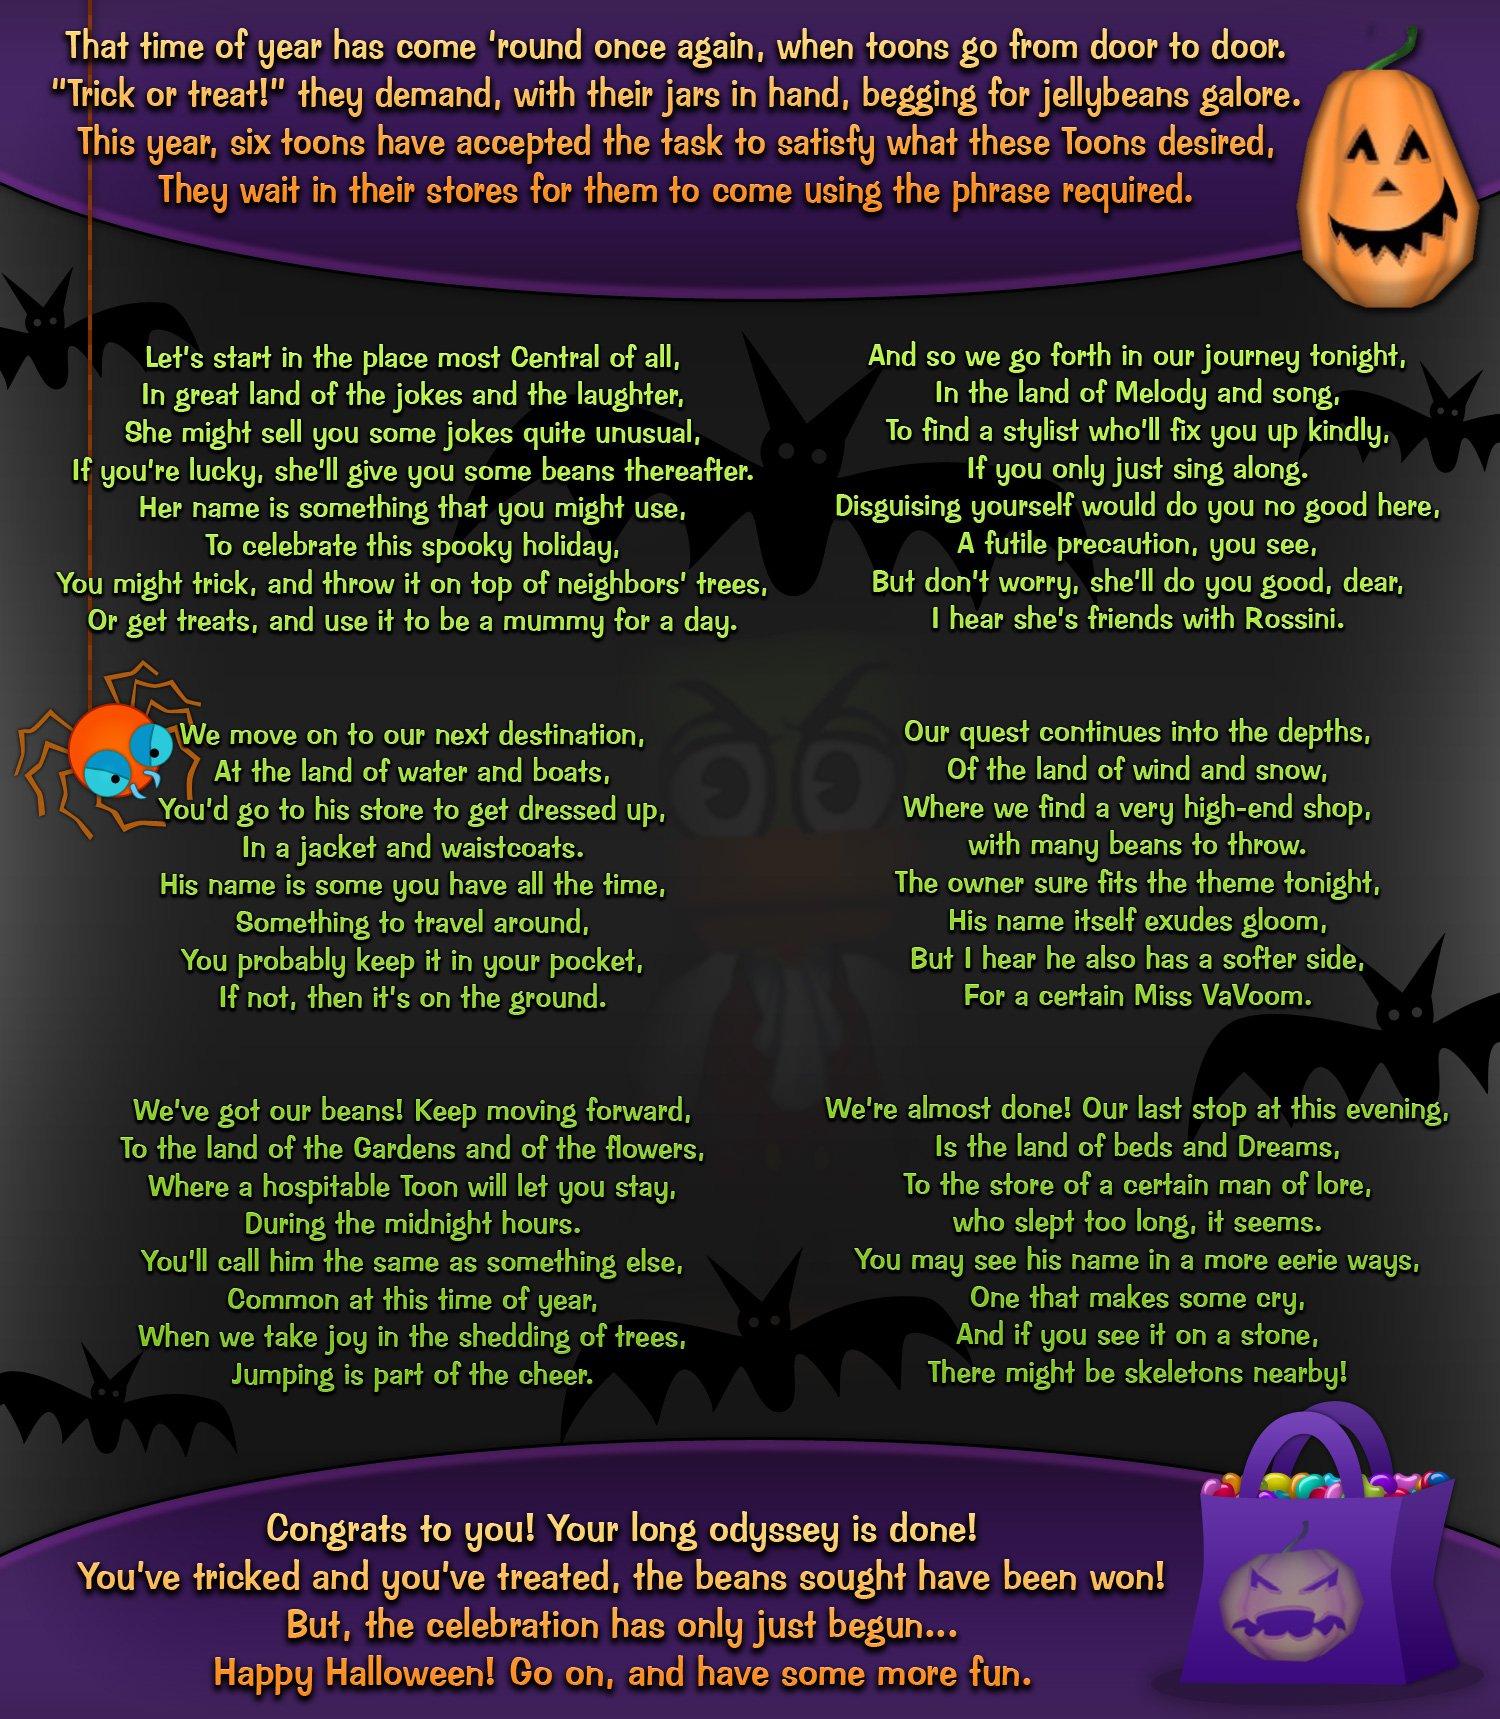 Toontown Rewritten 2020 Halloween Halloween | Toontown Rewritten Wiki | Fandom